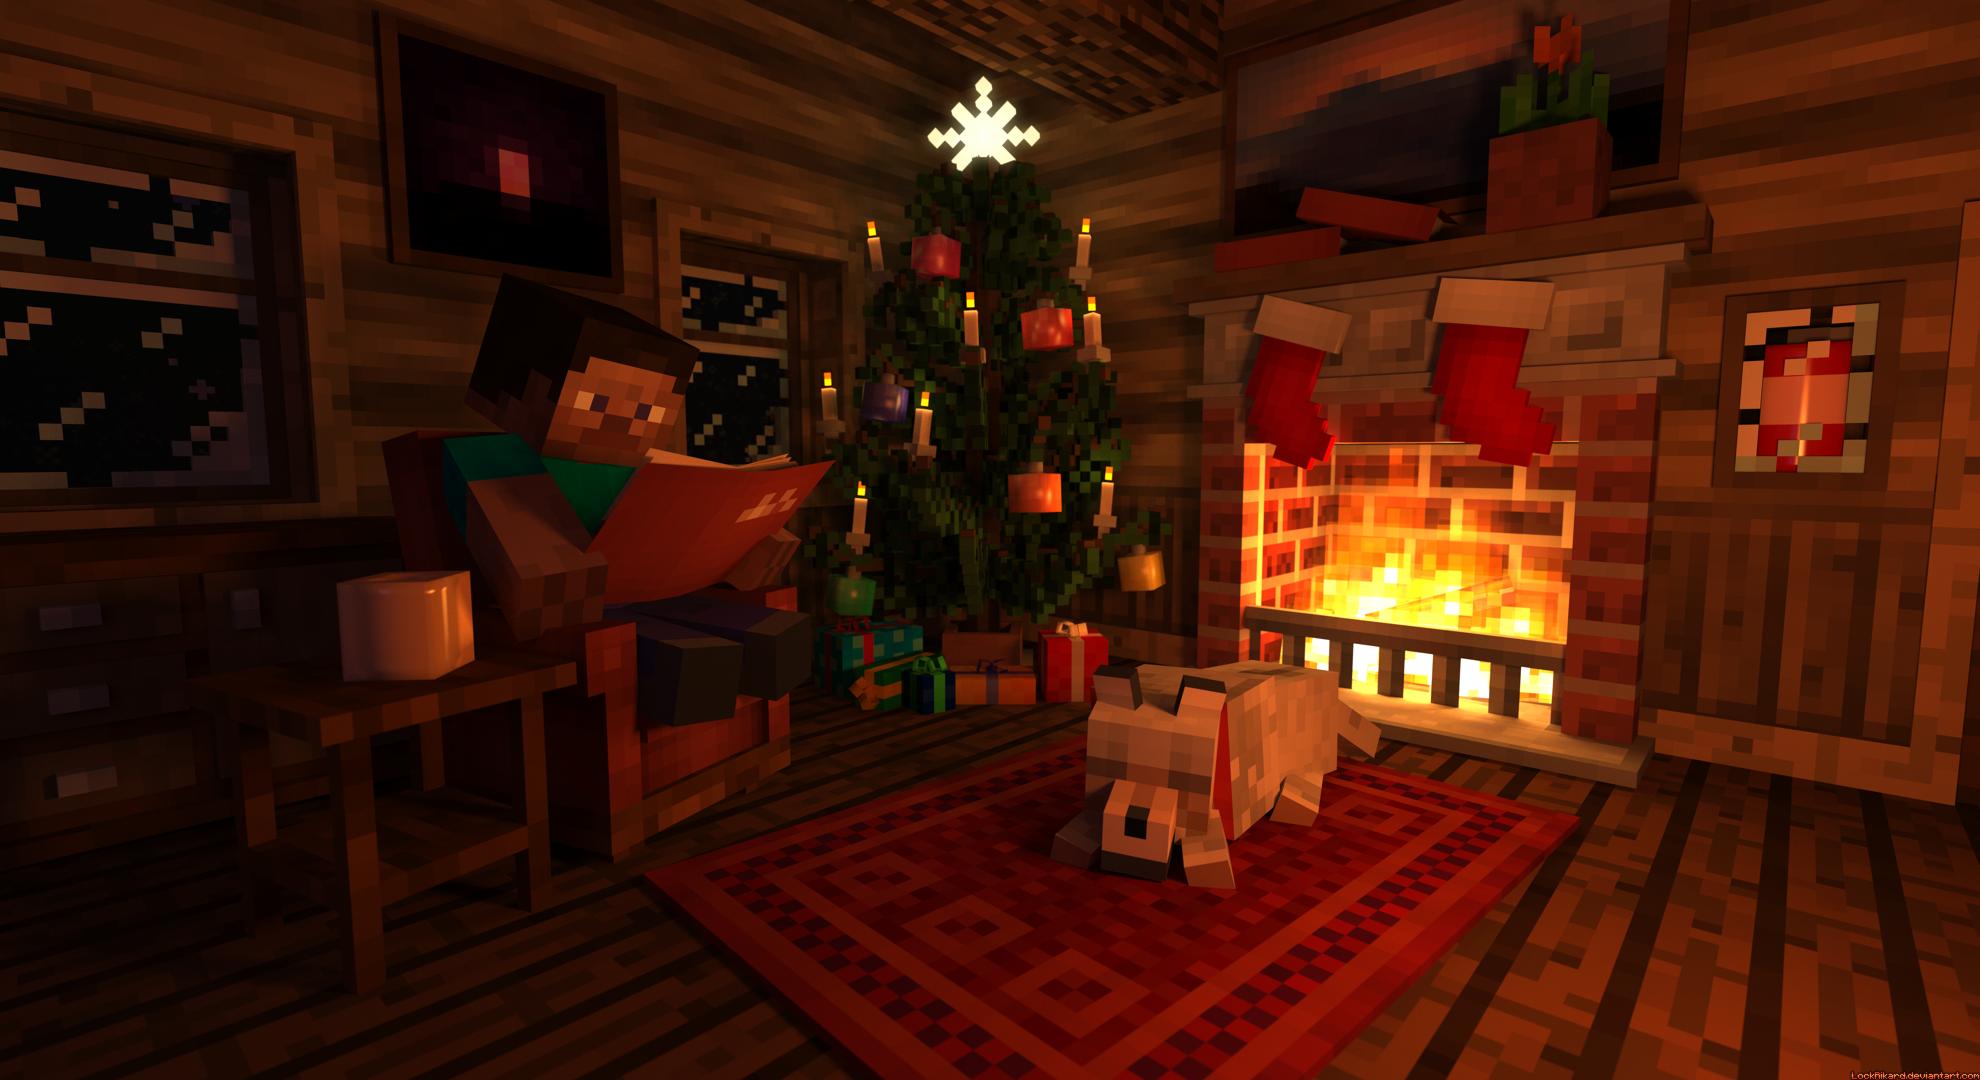 Steve's Christmas Cabin by LockRikard on DeviantArt